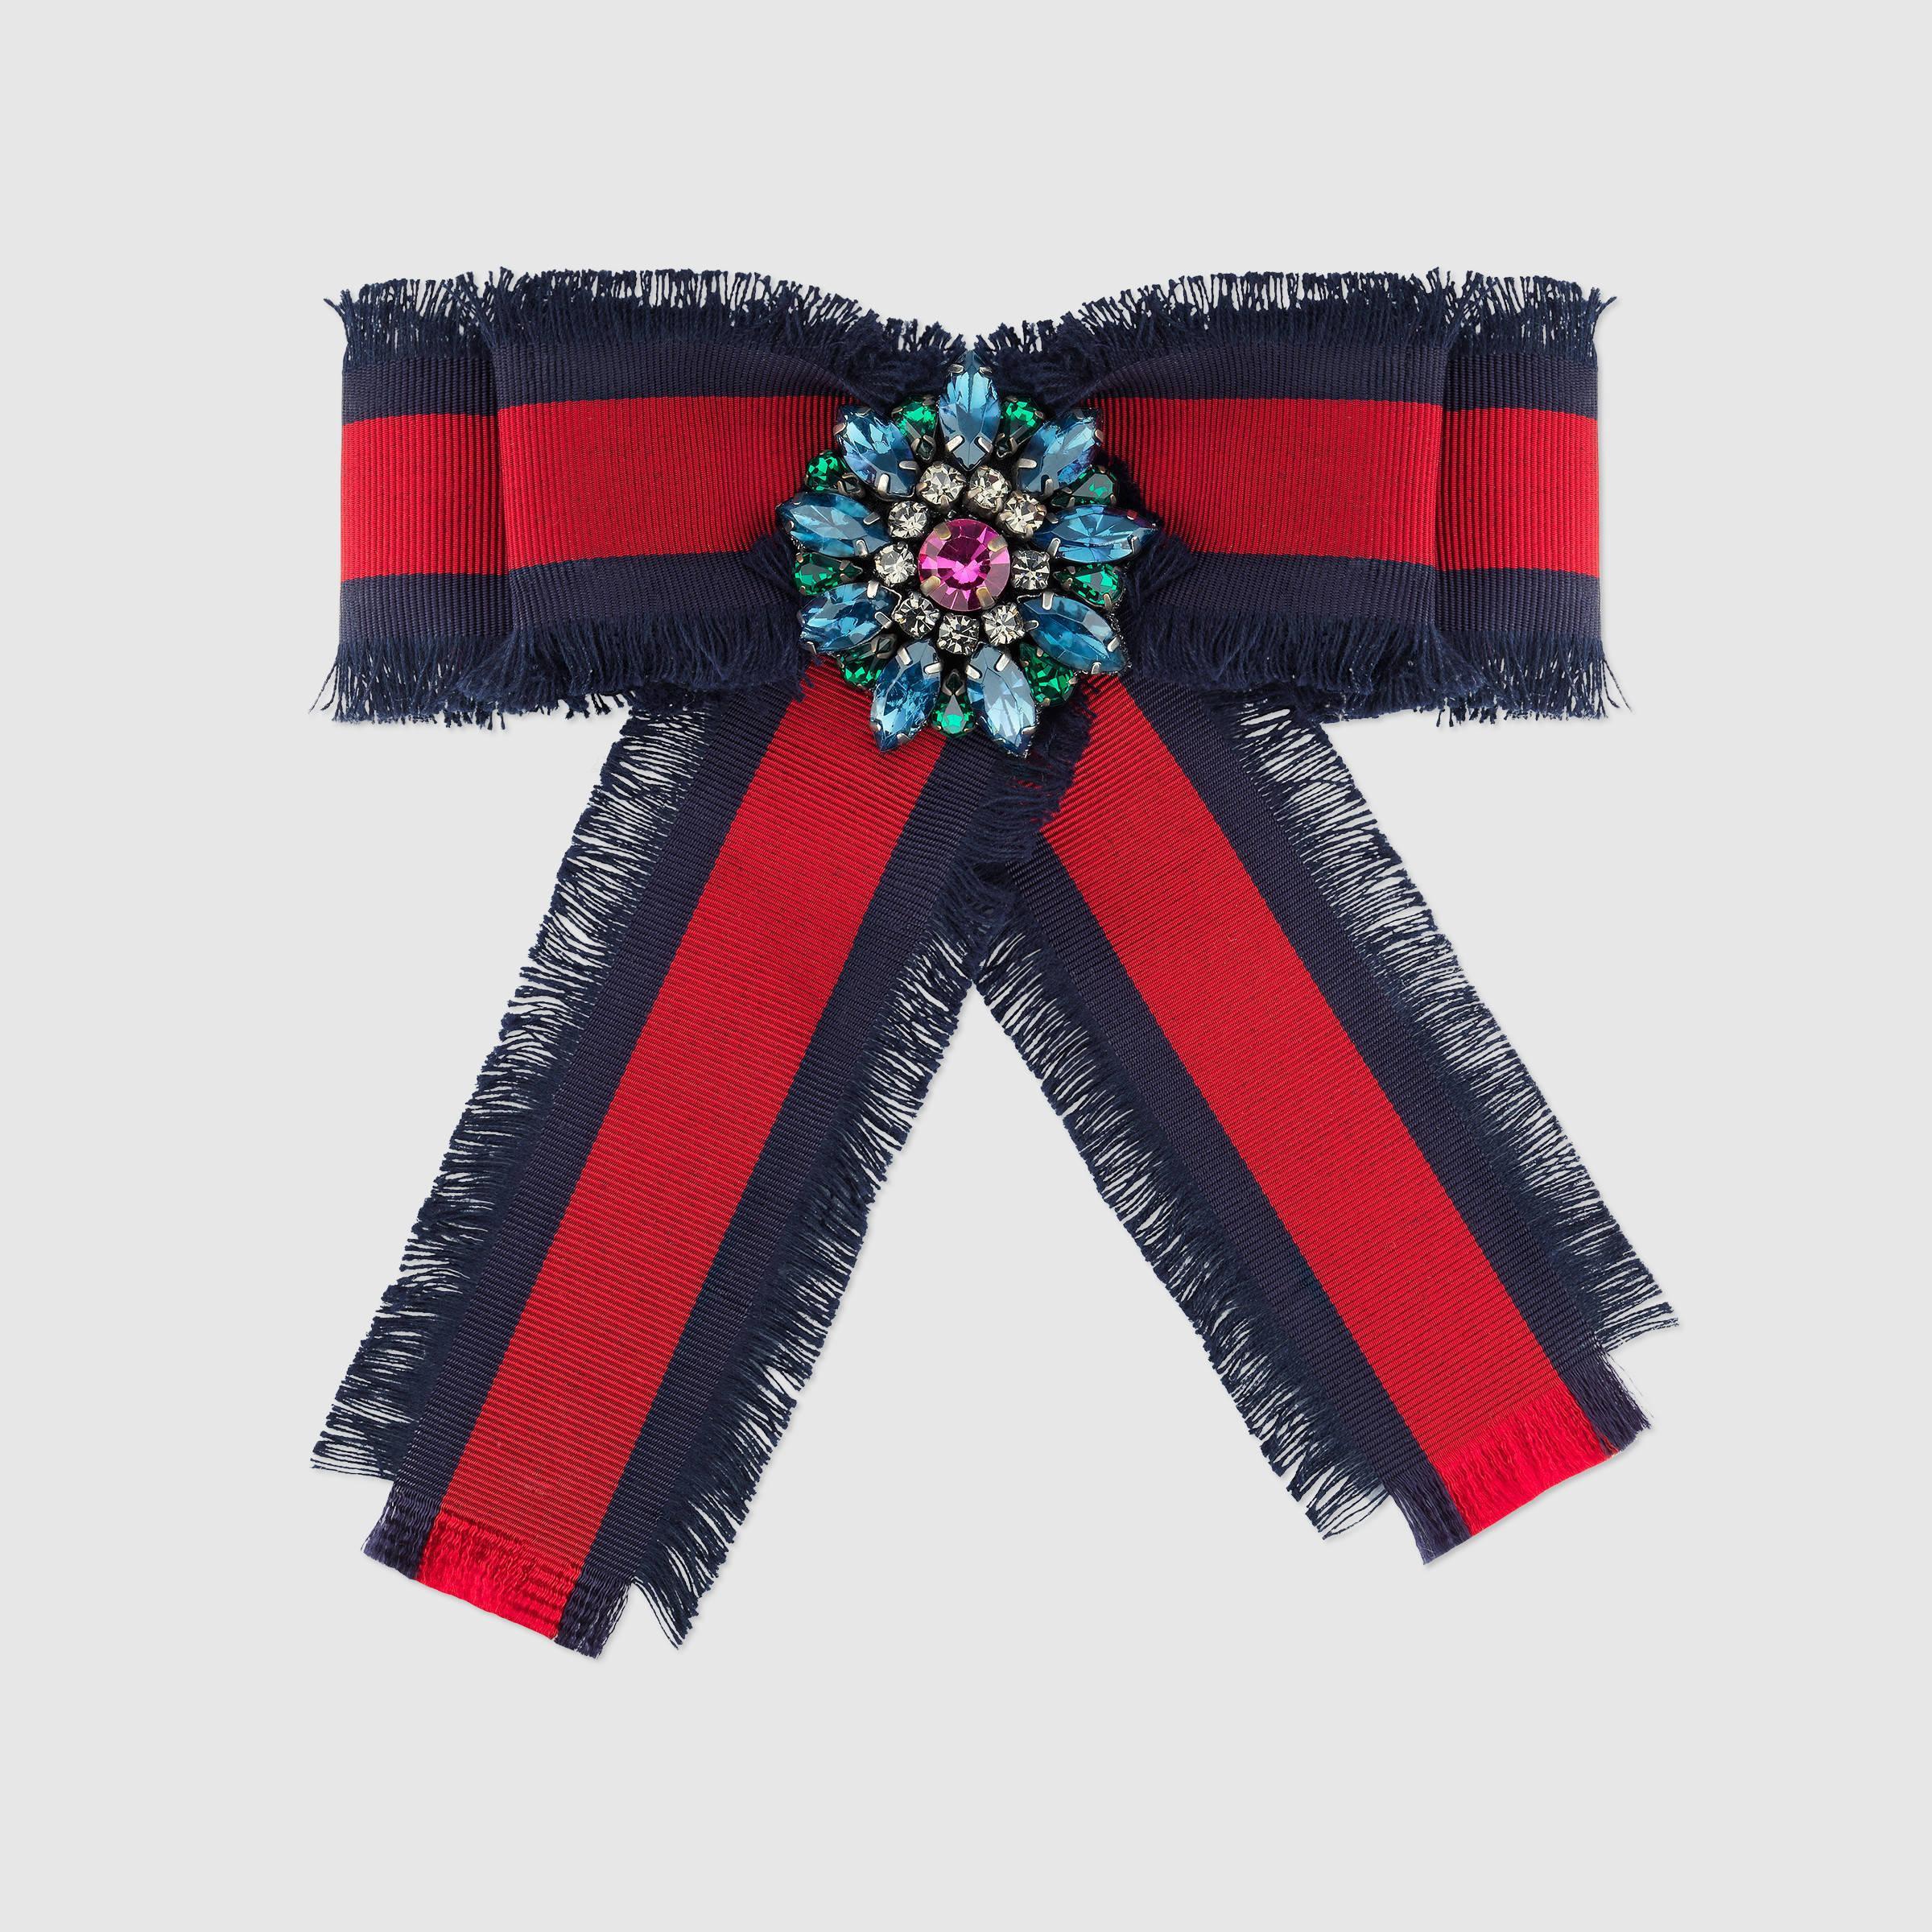 Gucci Brooches  Gucci Web Grosgrain Bow Brooch in Multicolor